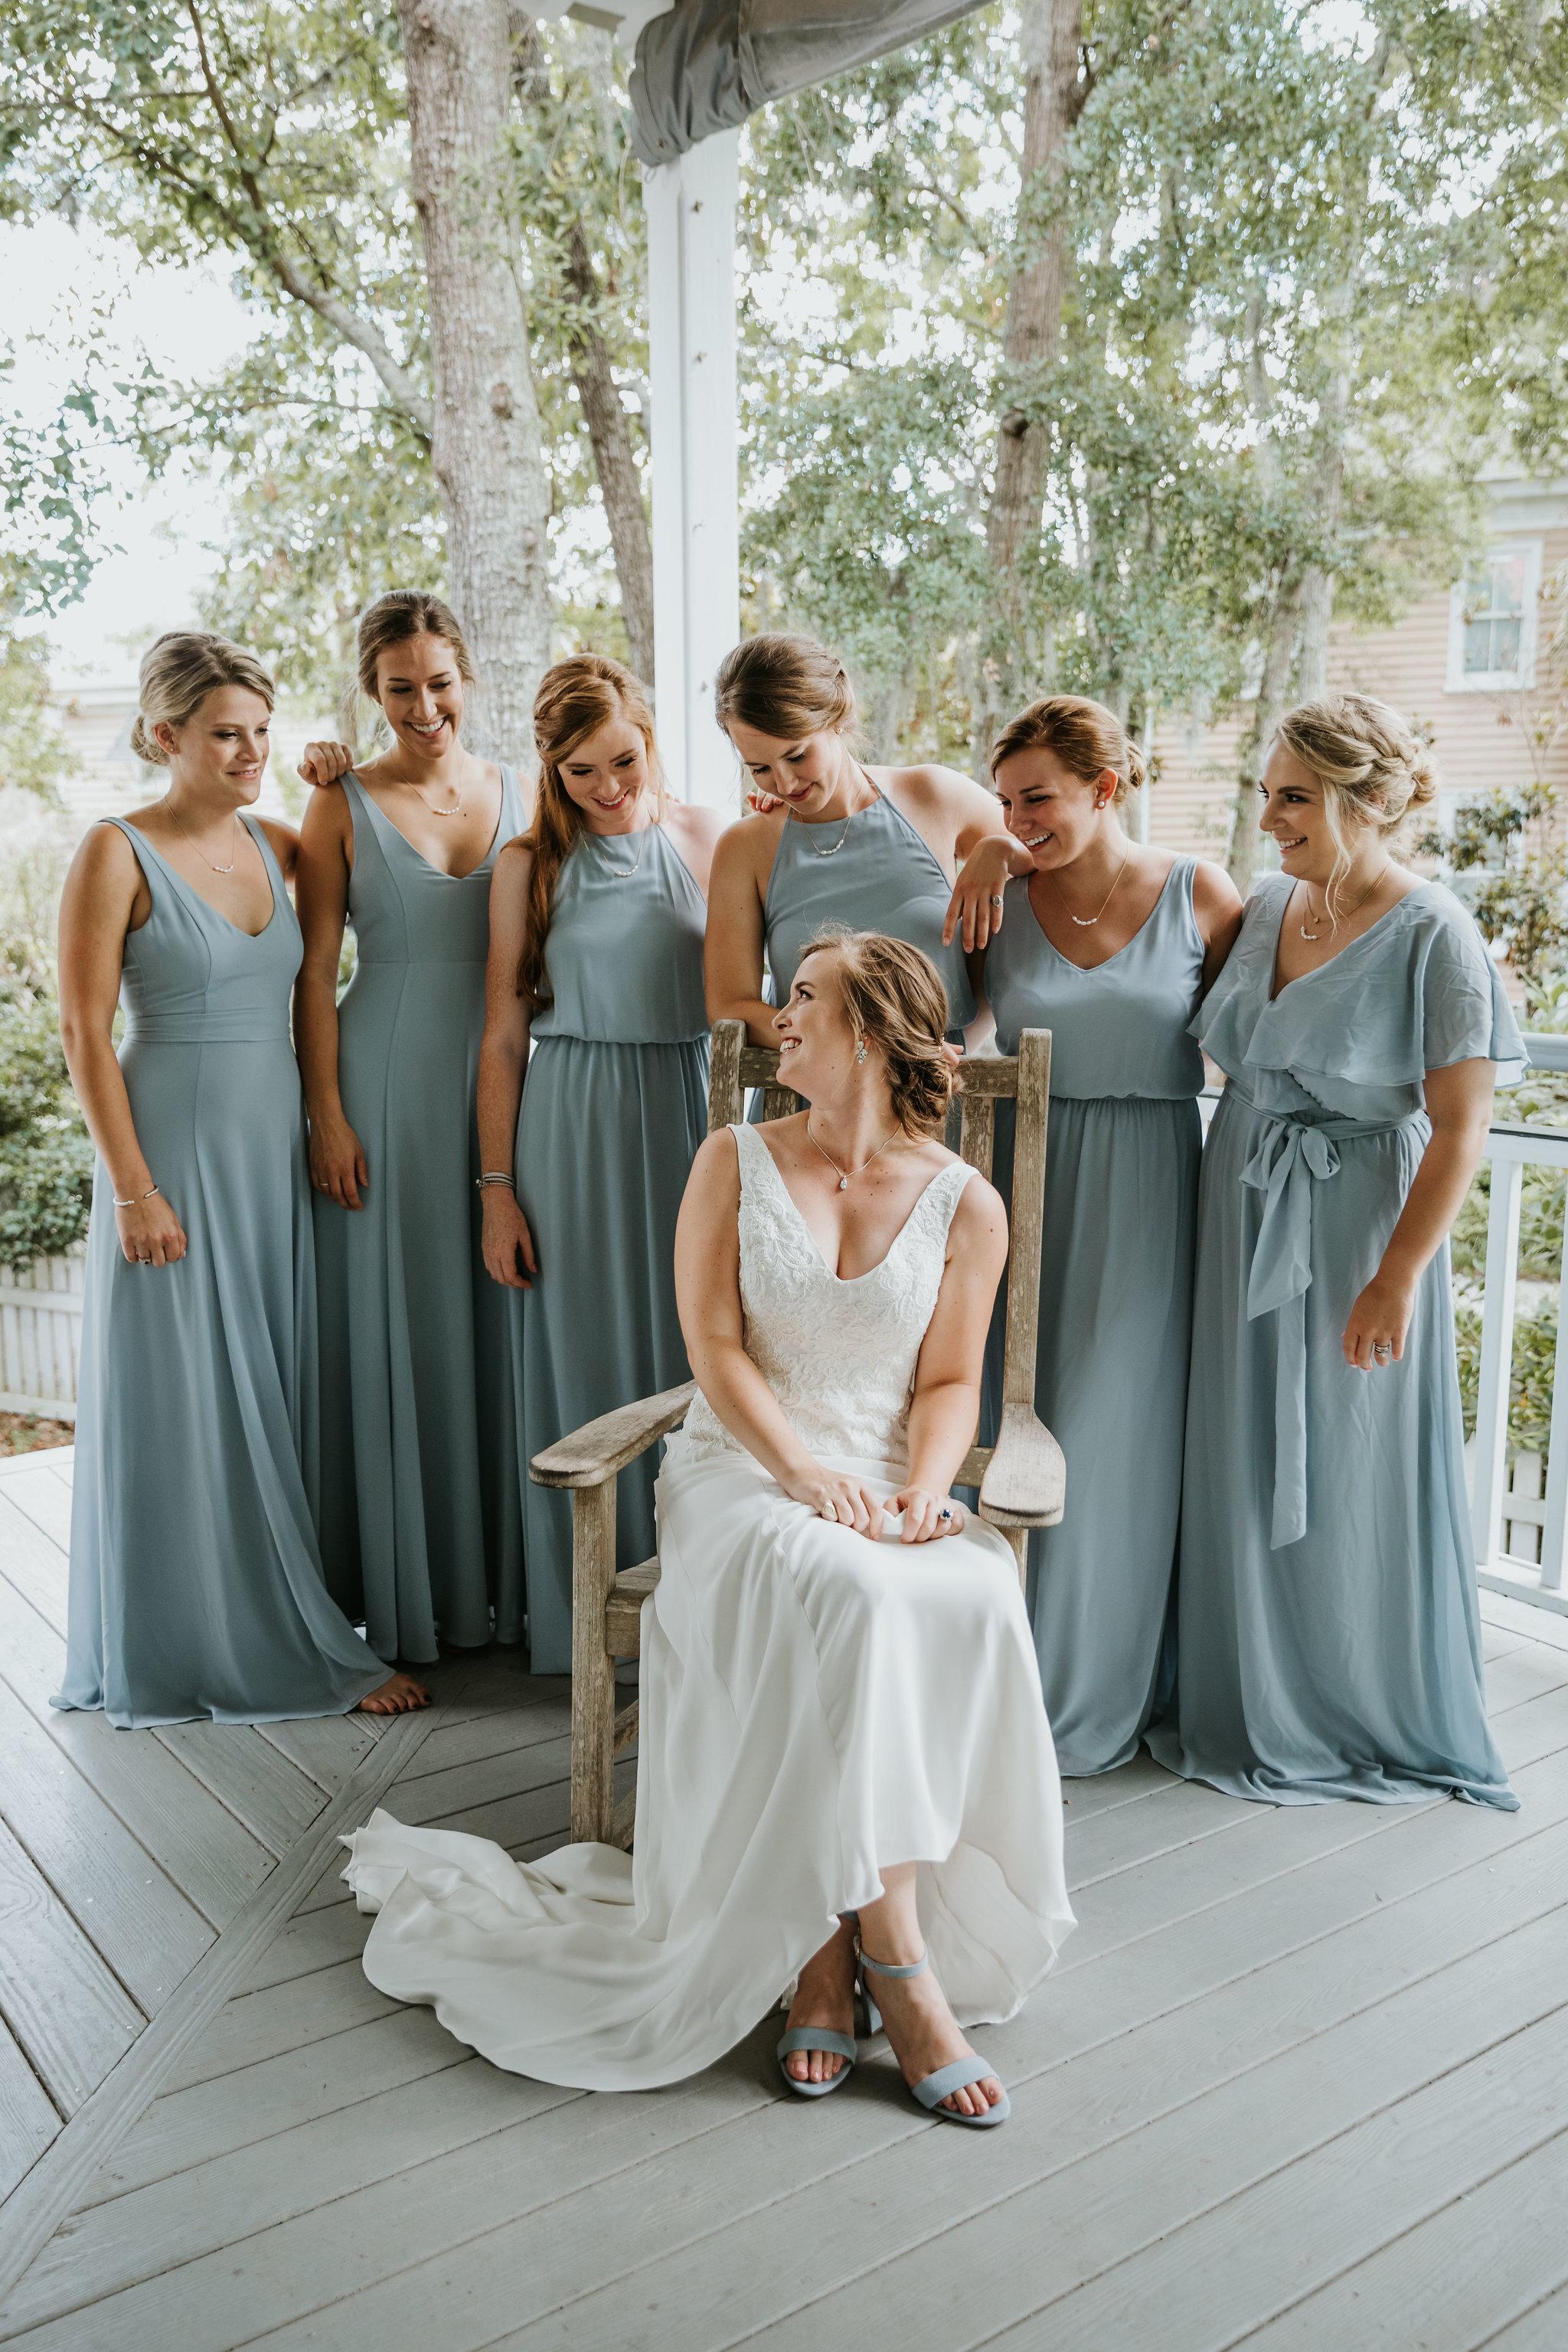 Creekclub-at-Ion-Charleston-SC-wedding-portrait-photographer-78.jpg